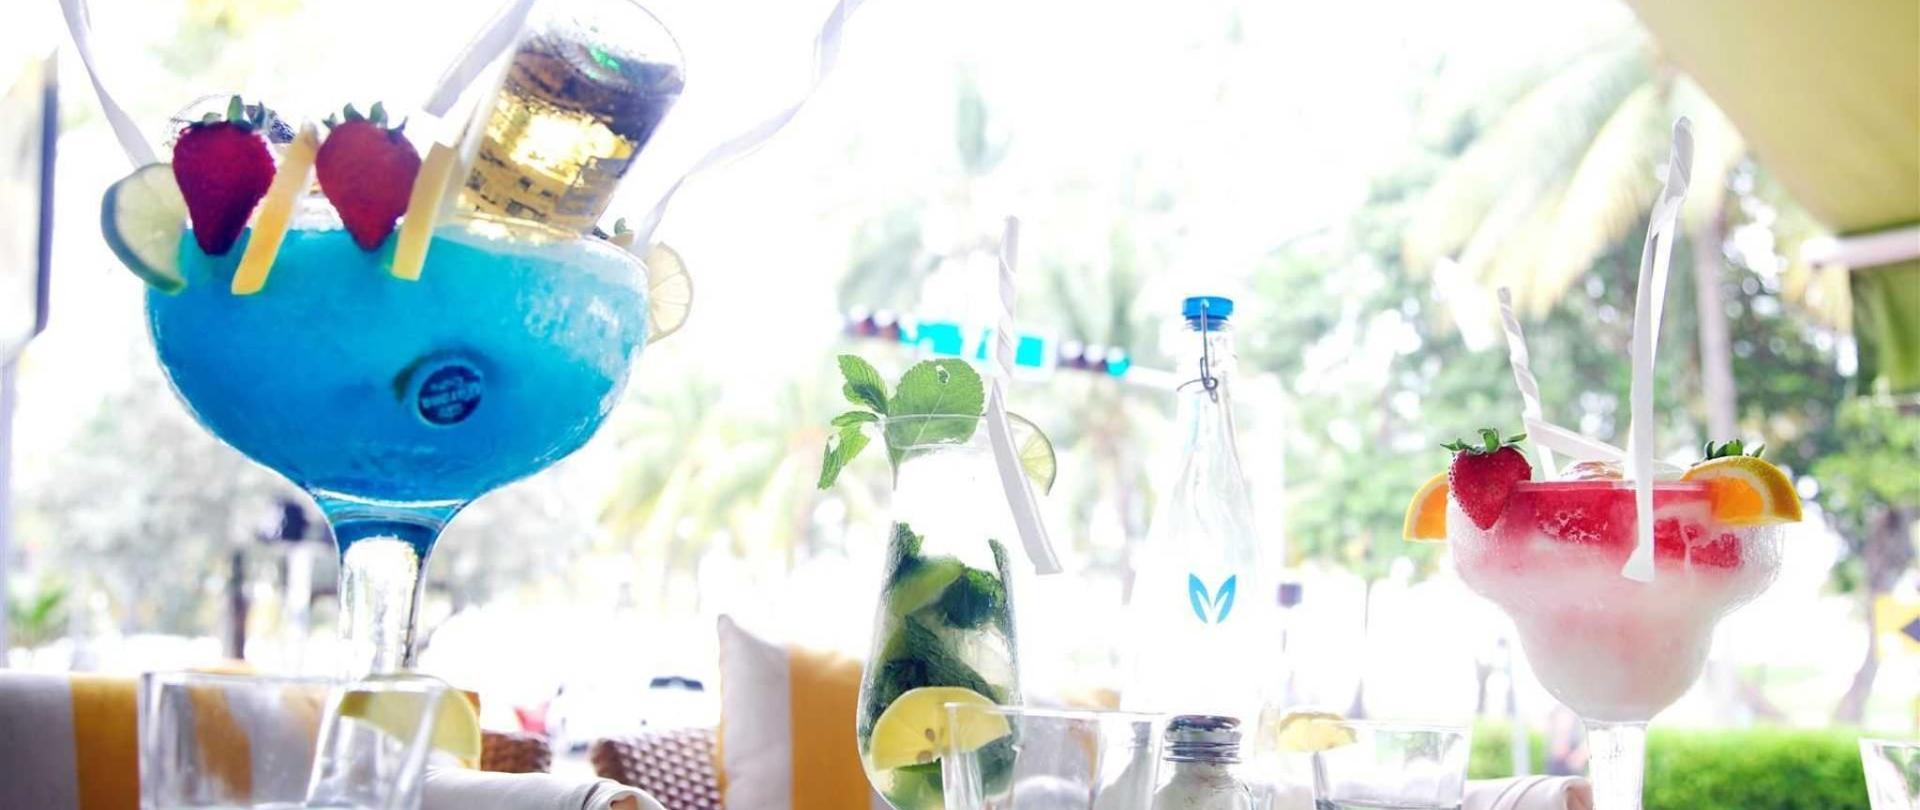 drinks.jpg.1920x0.jpg